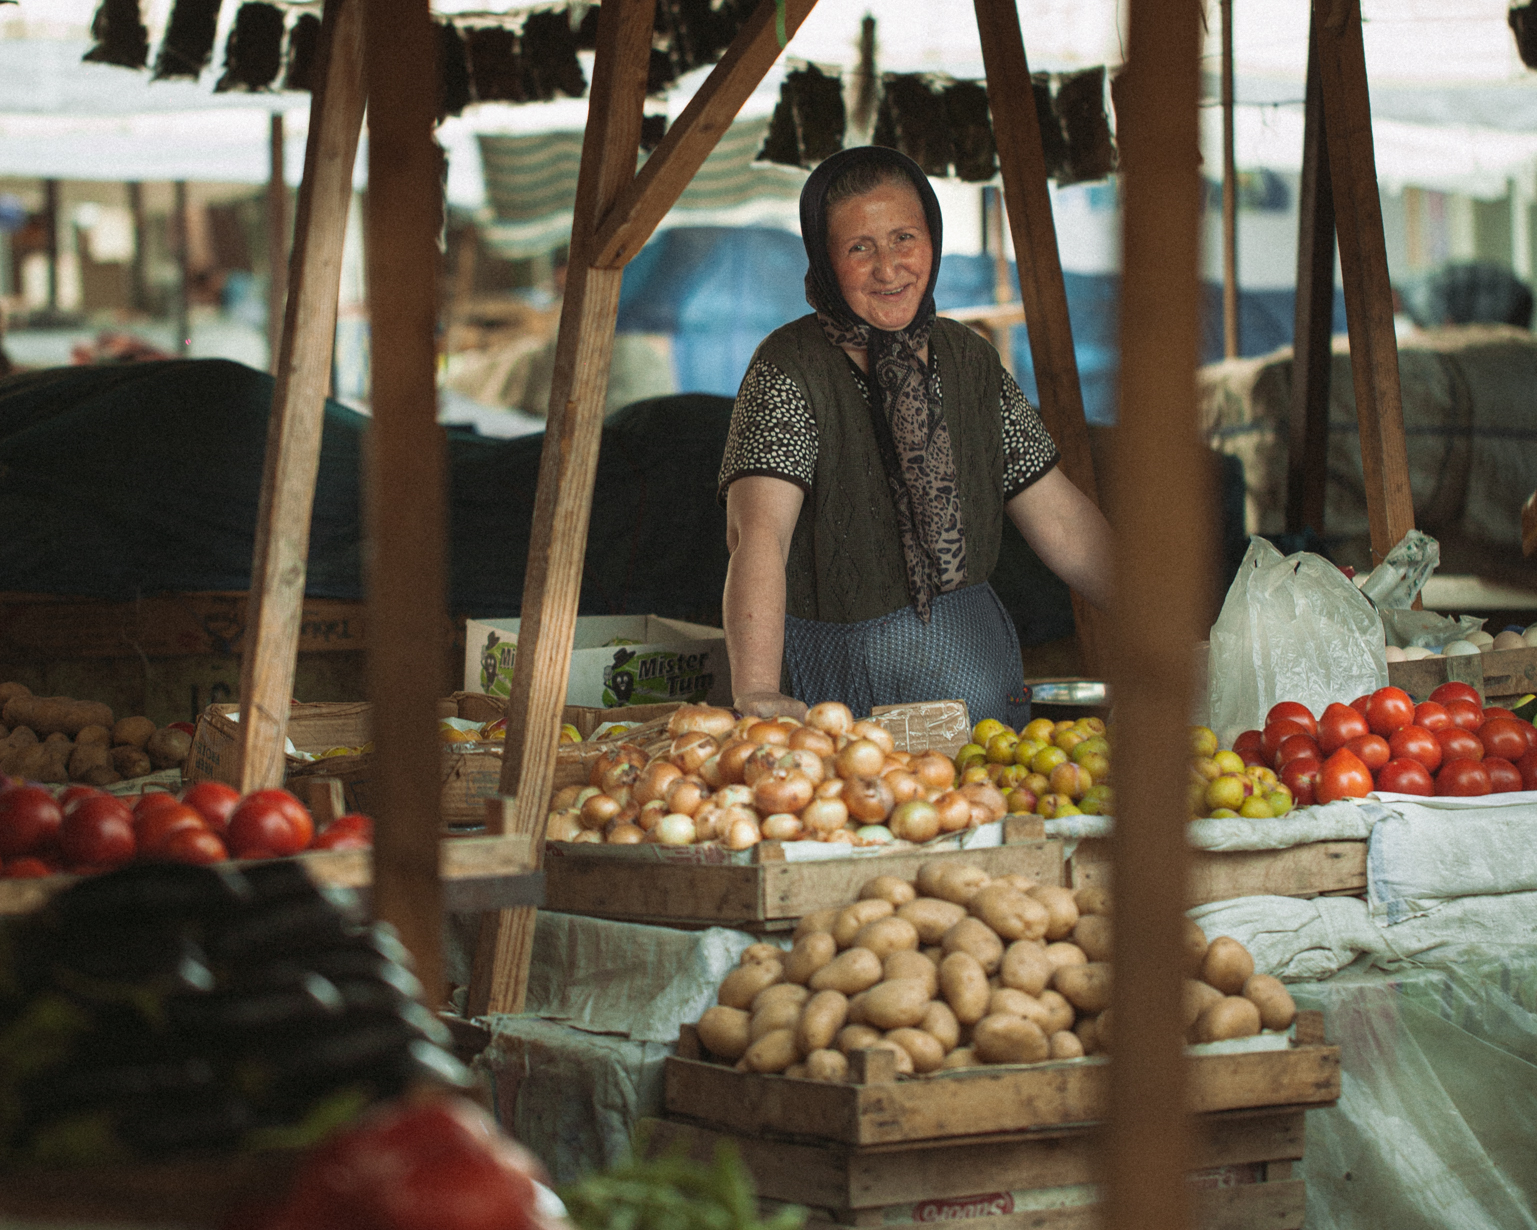 Valida sold vegetables in the bazaar. Shaki, 2015